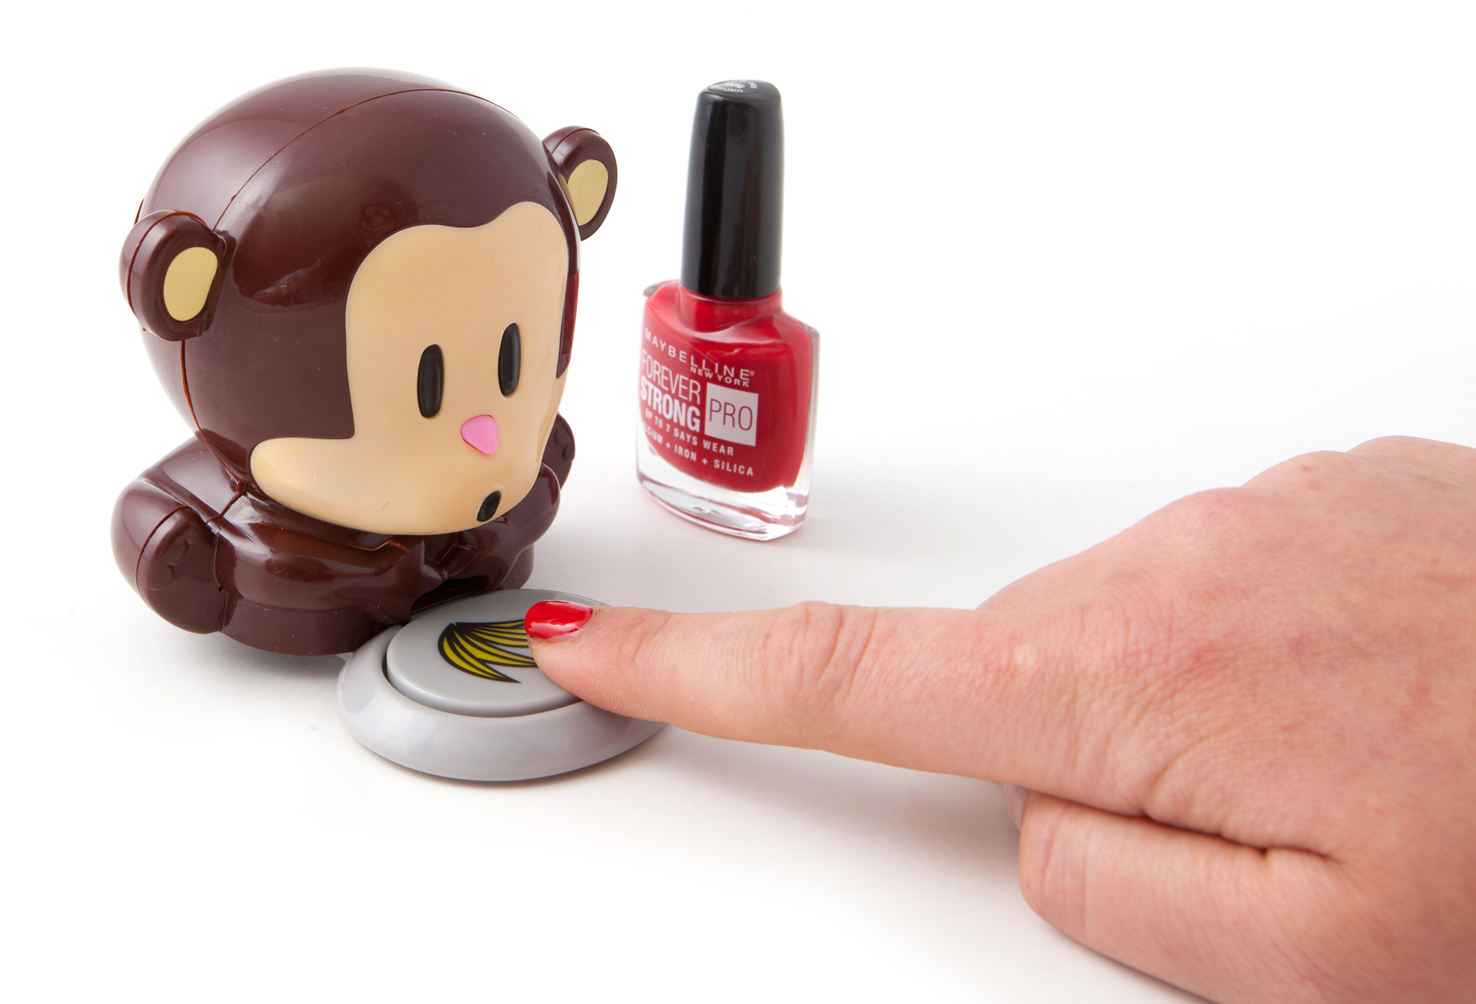 PROFI Nageltrockner lackierte Fingernägel Trockner schnell trocknen Affe Äffchen